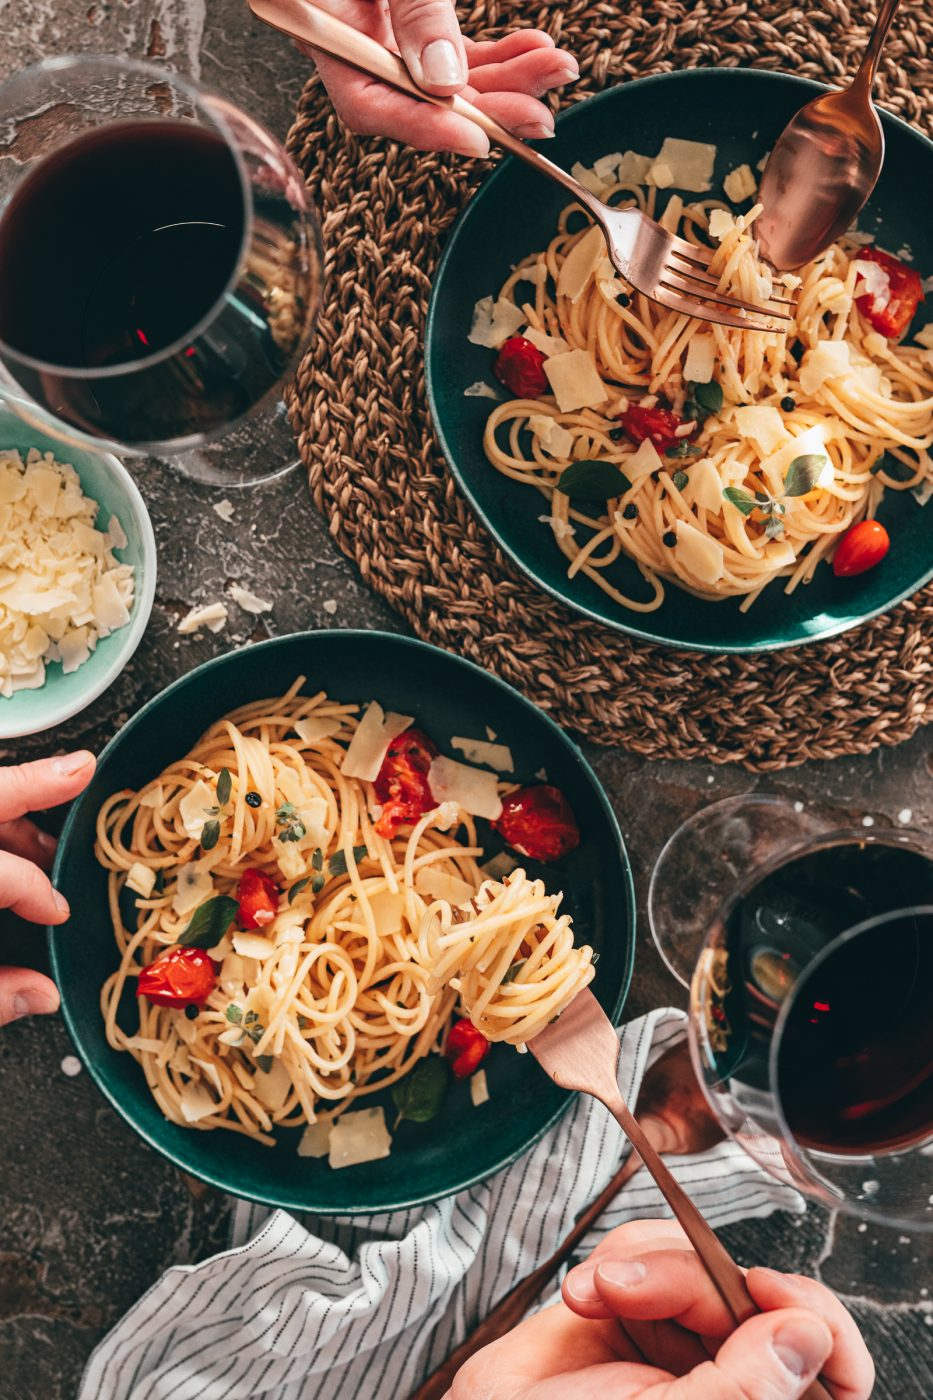 Spaghetti Aglio e Olio auf Teller und Gabel